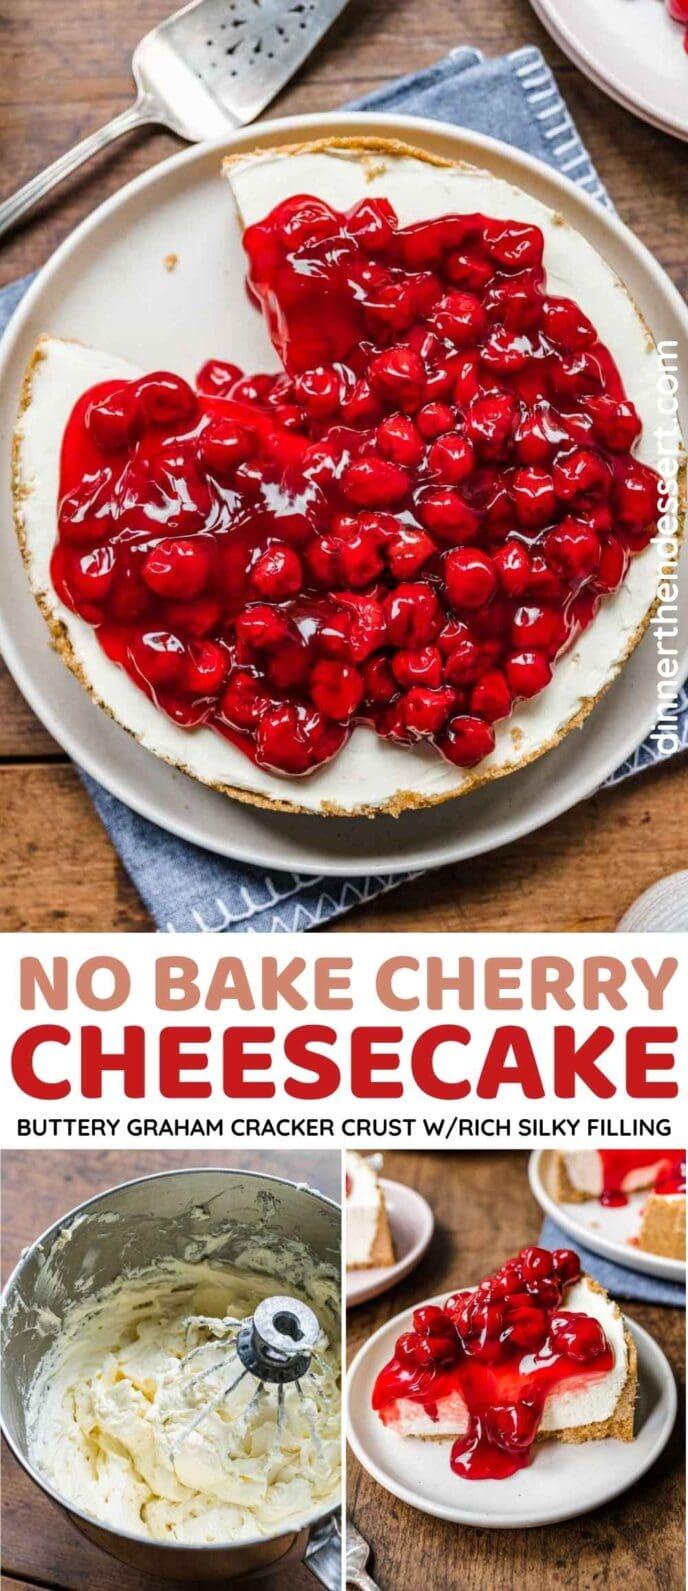 No Bake Cherry Cheesecake Collage